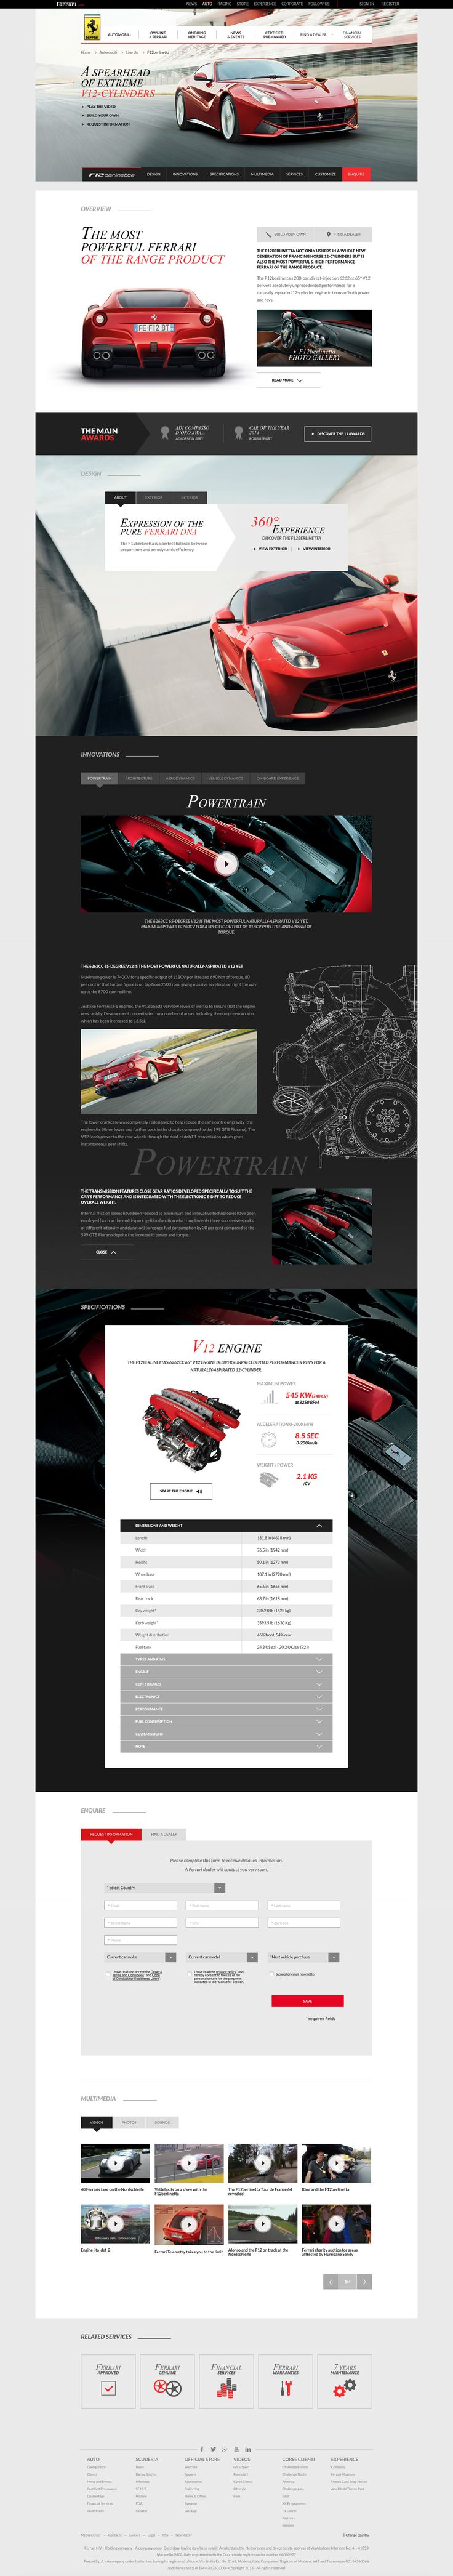 Ferrari page design template for their automobiles.